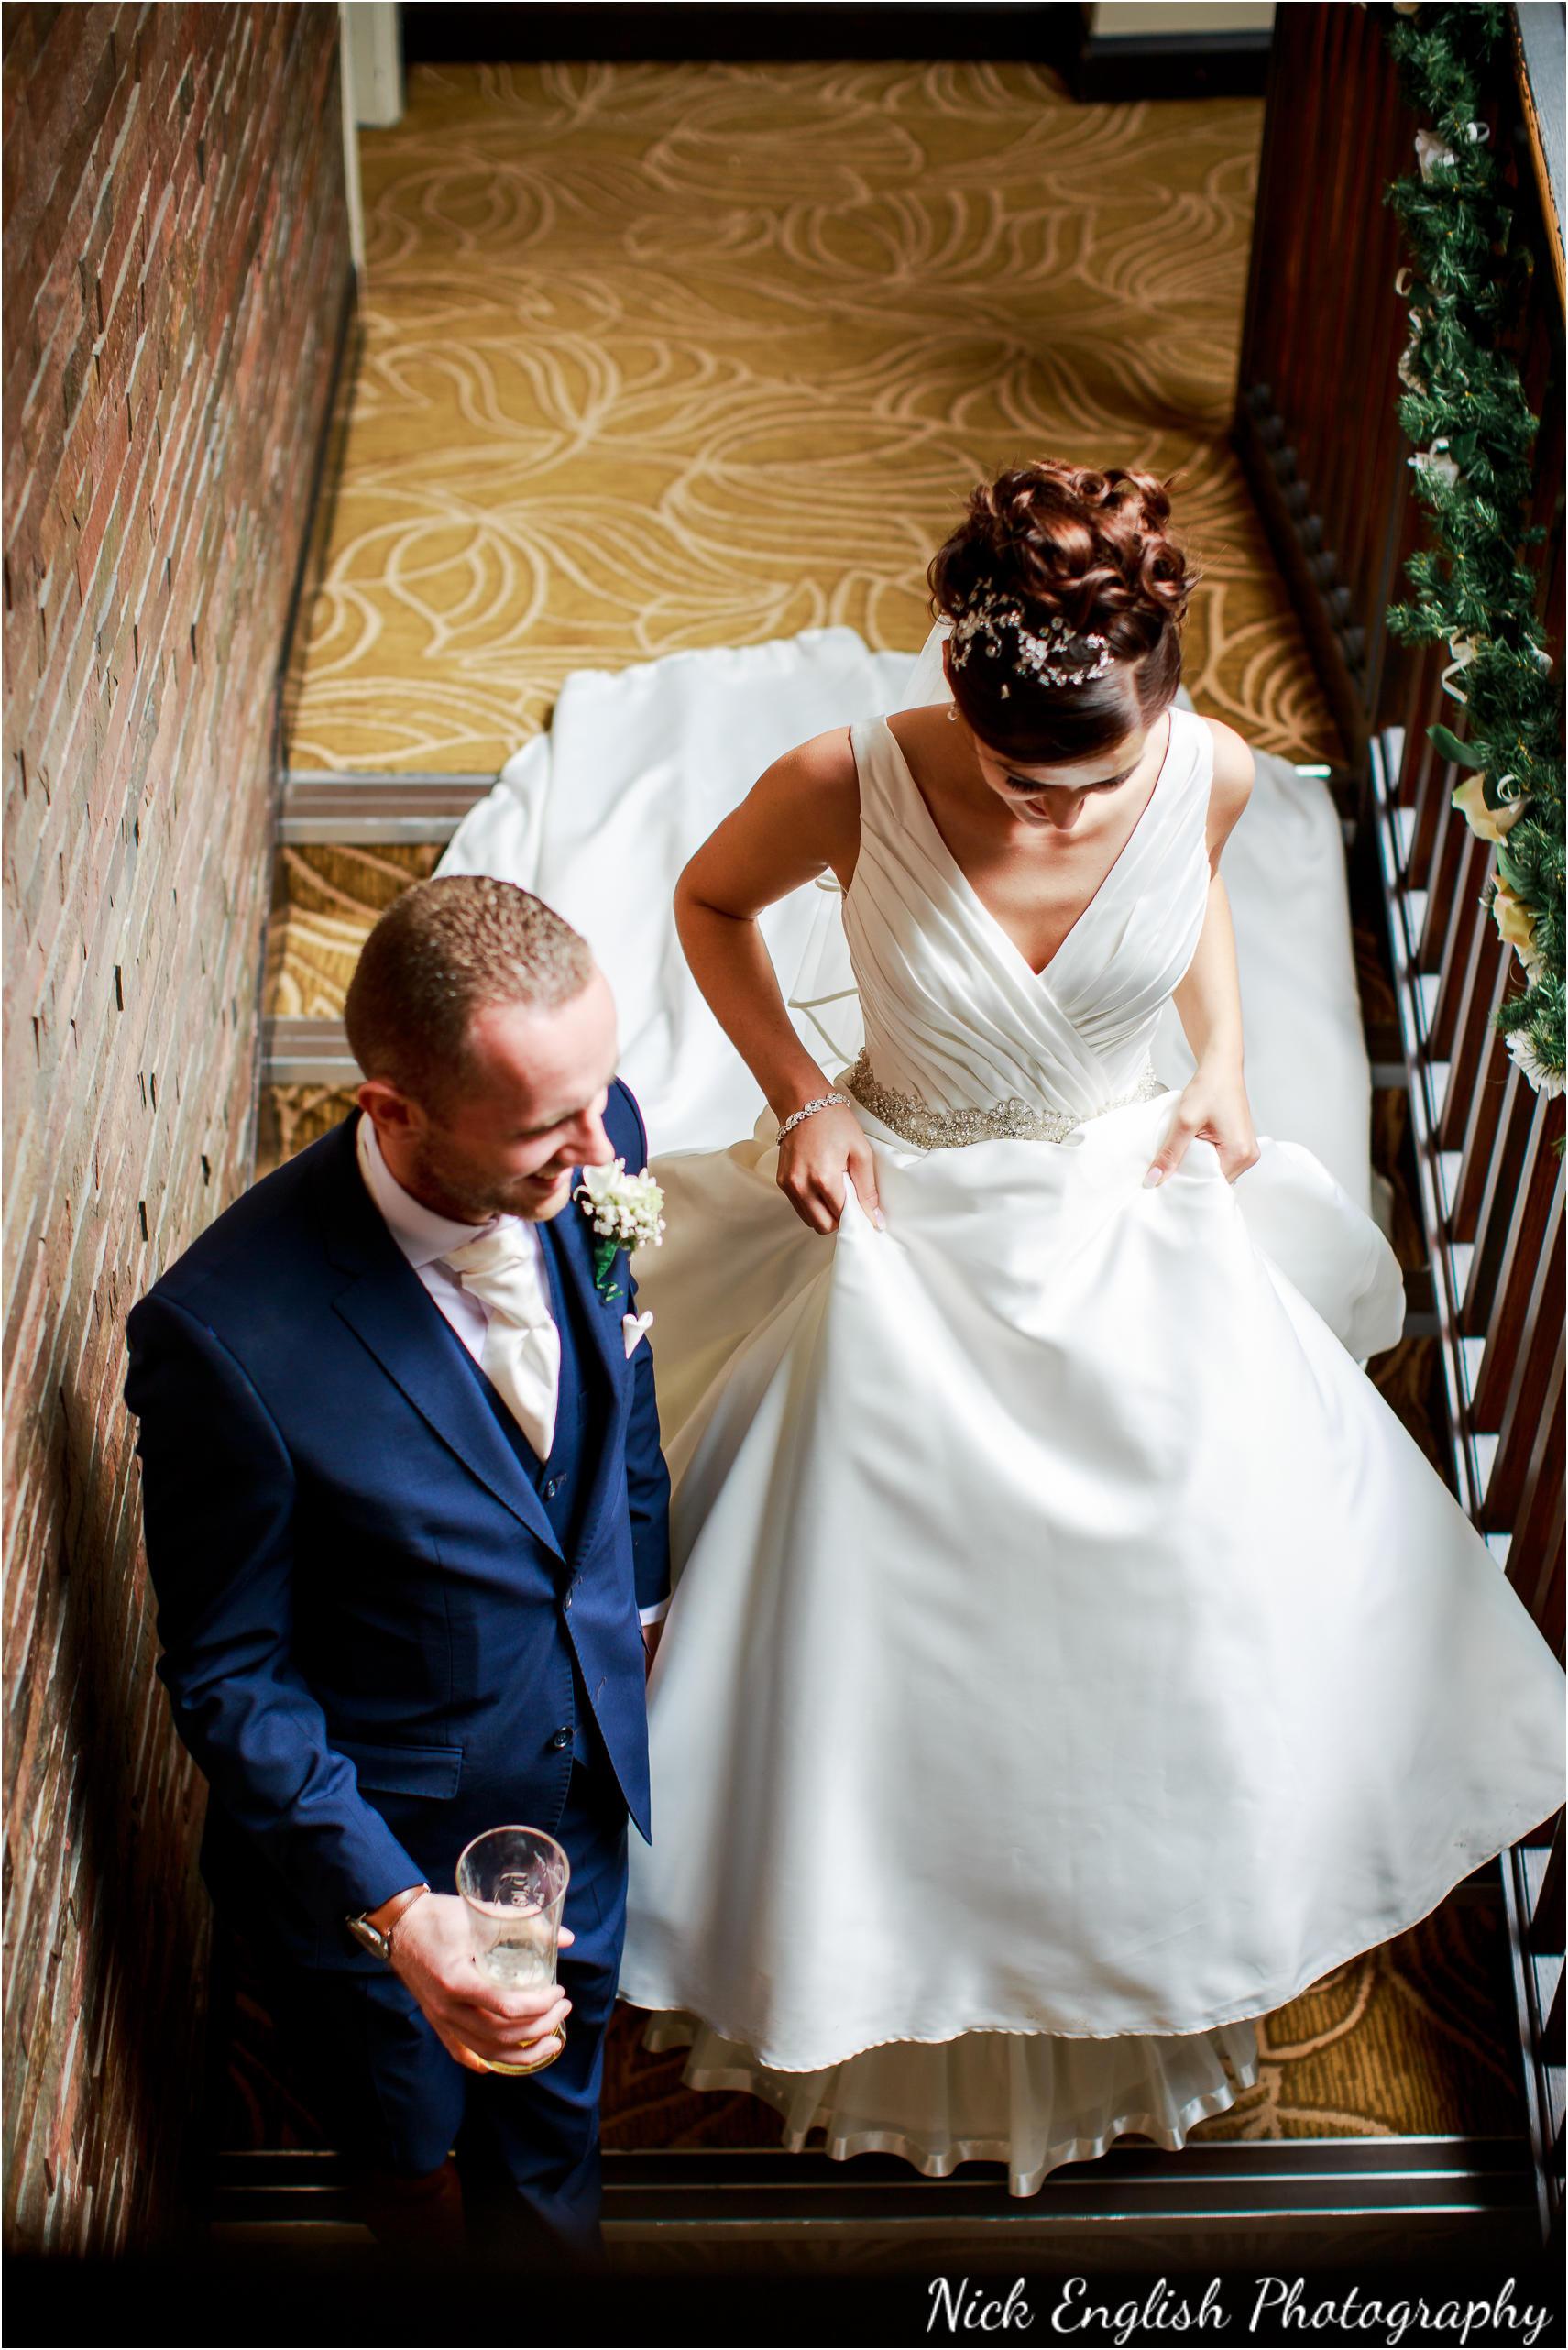 Emily David Wedding Photographs at Barton Grange Preston by Nick English Photography 155jpg.jpeg